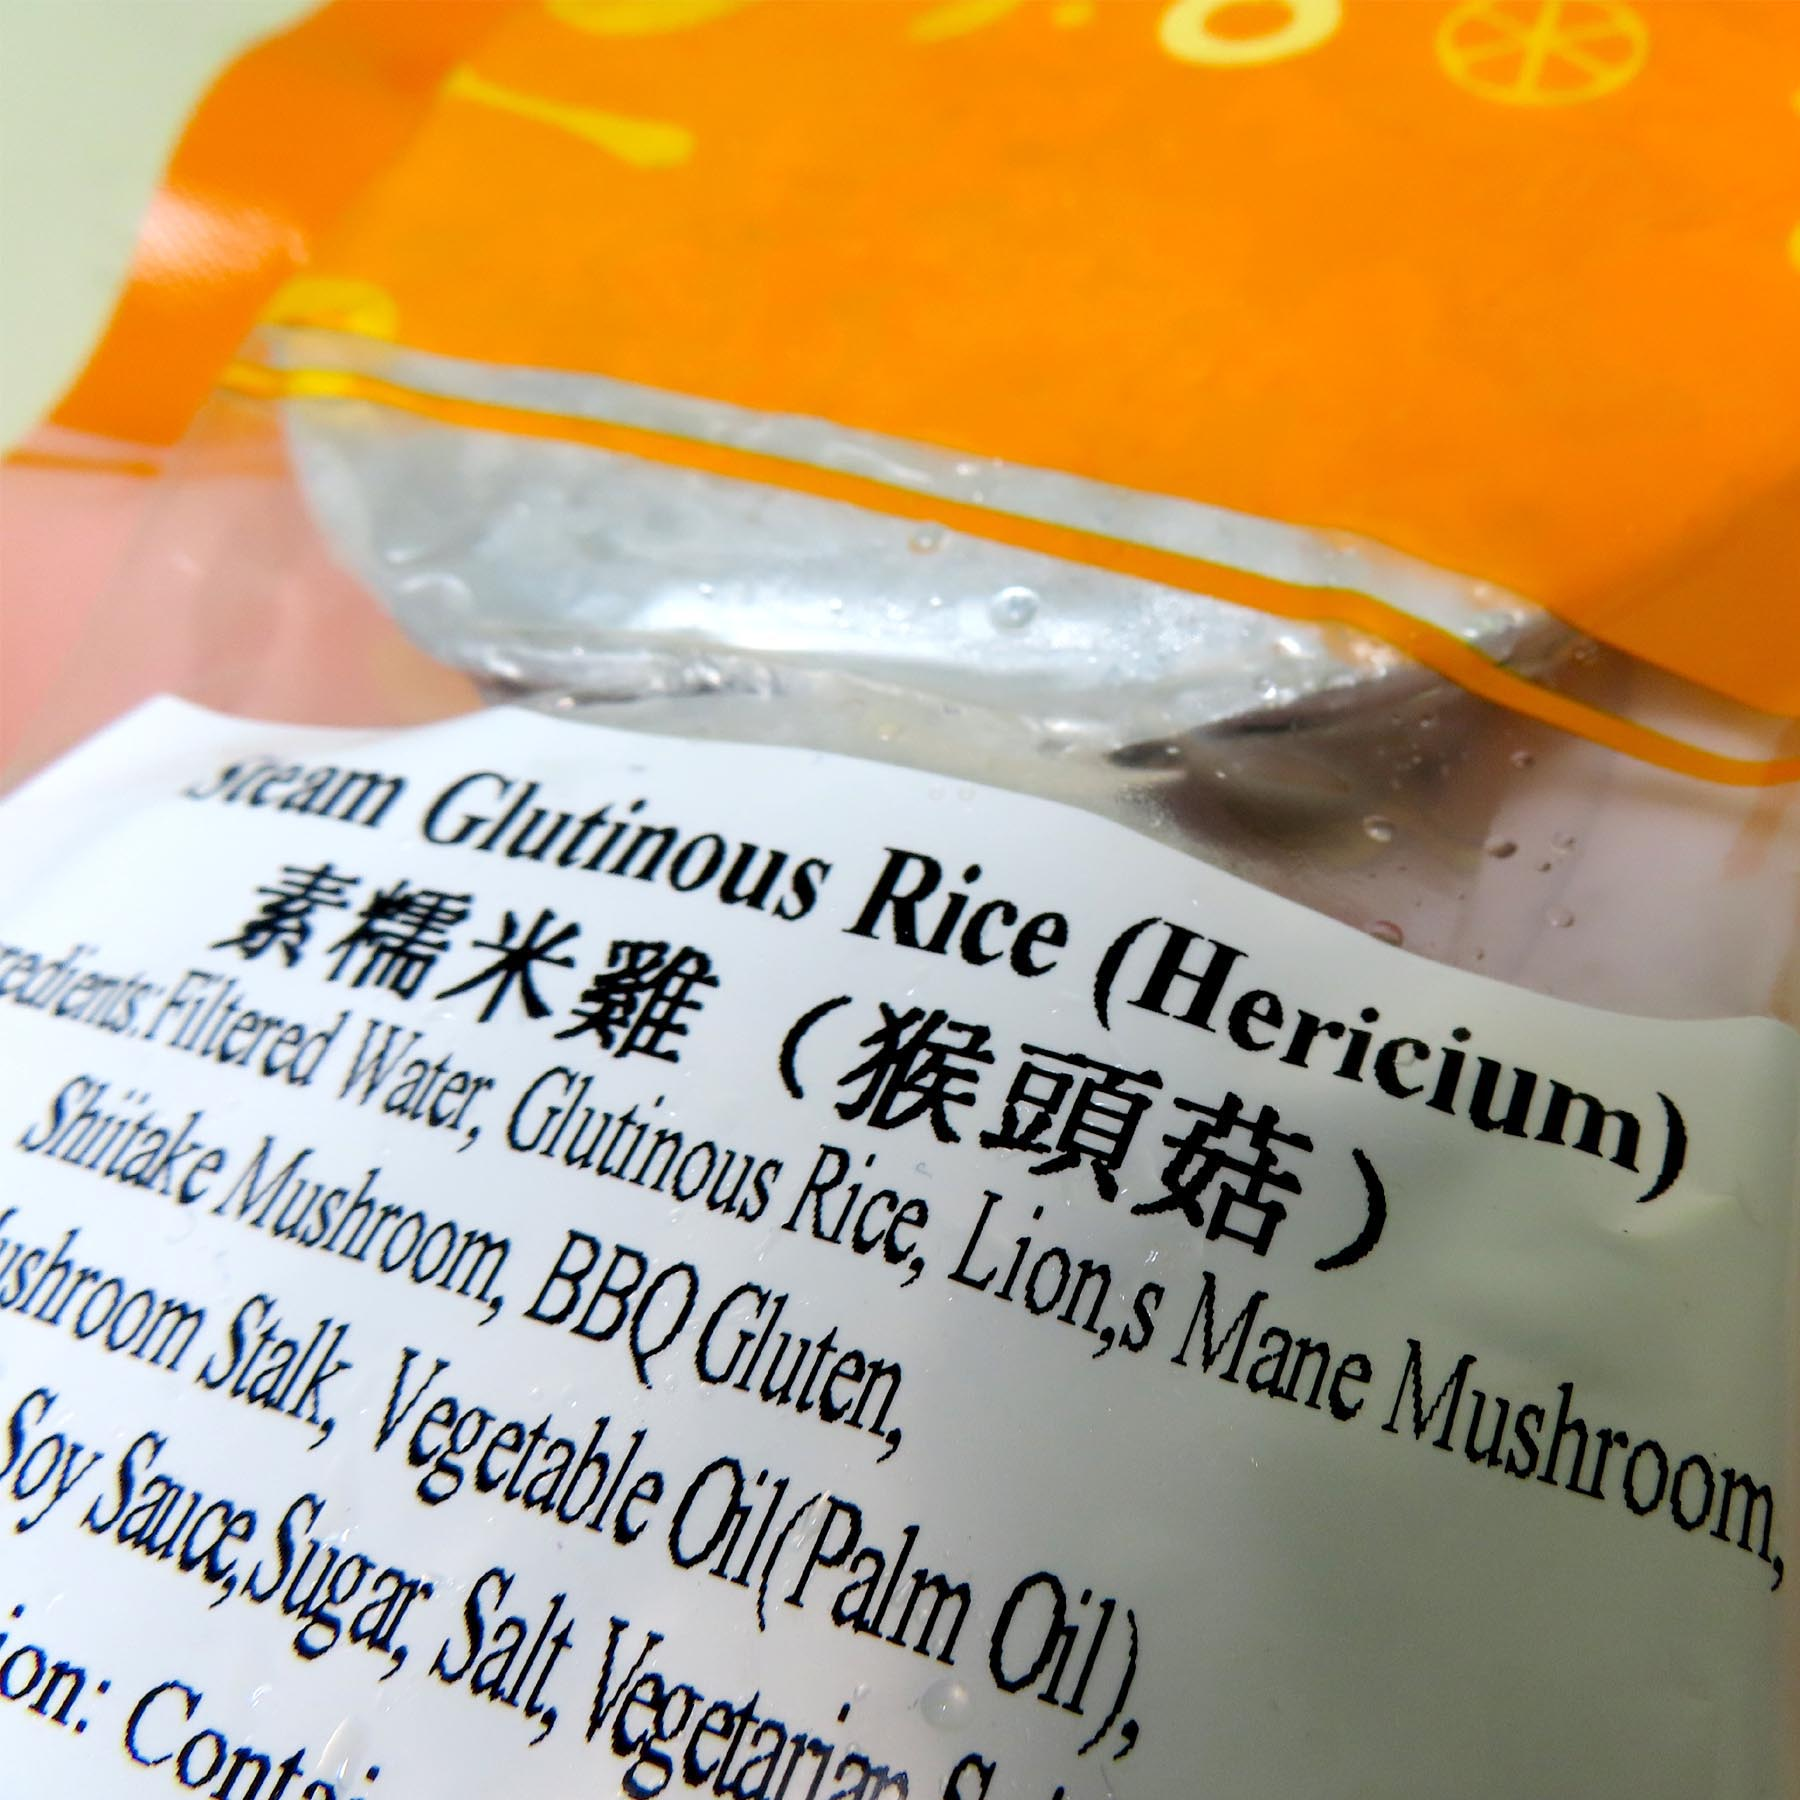 Image Friendly FV Foods Hericium Glutinous Rice 善缘猴头菇糯米鸡